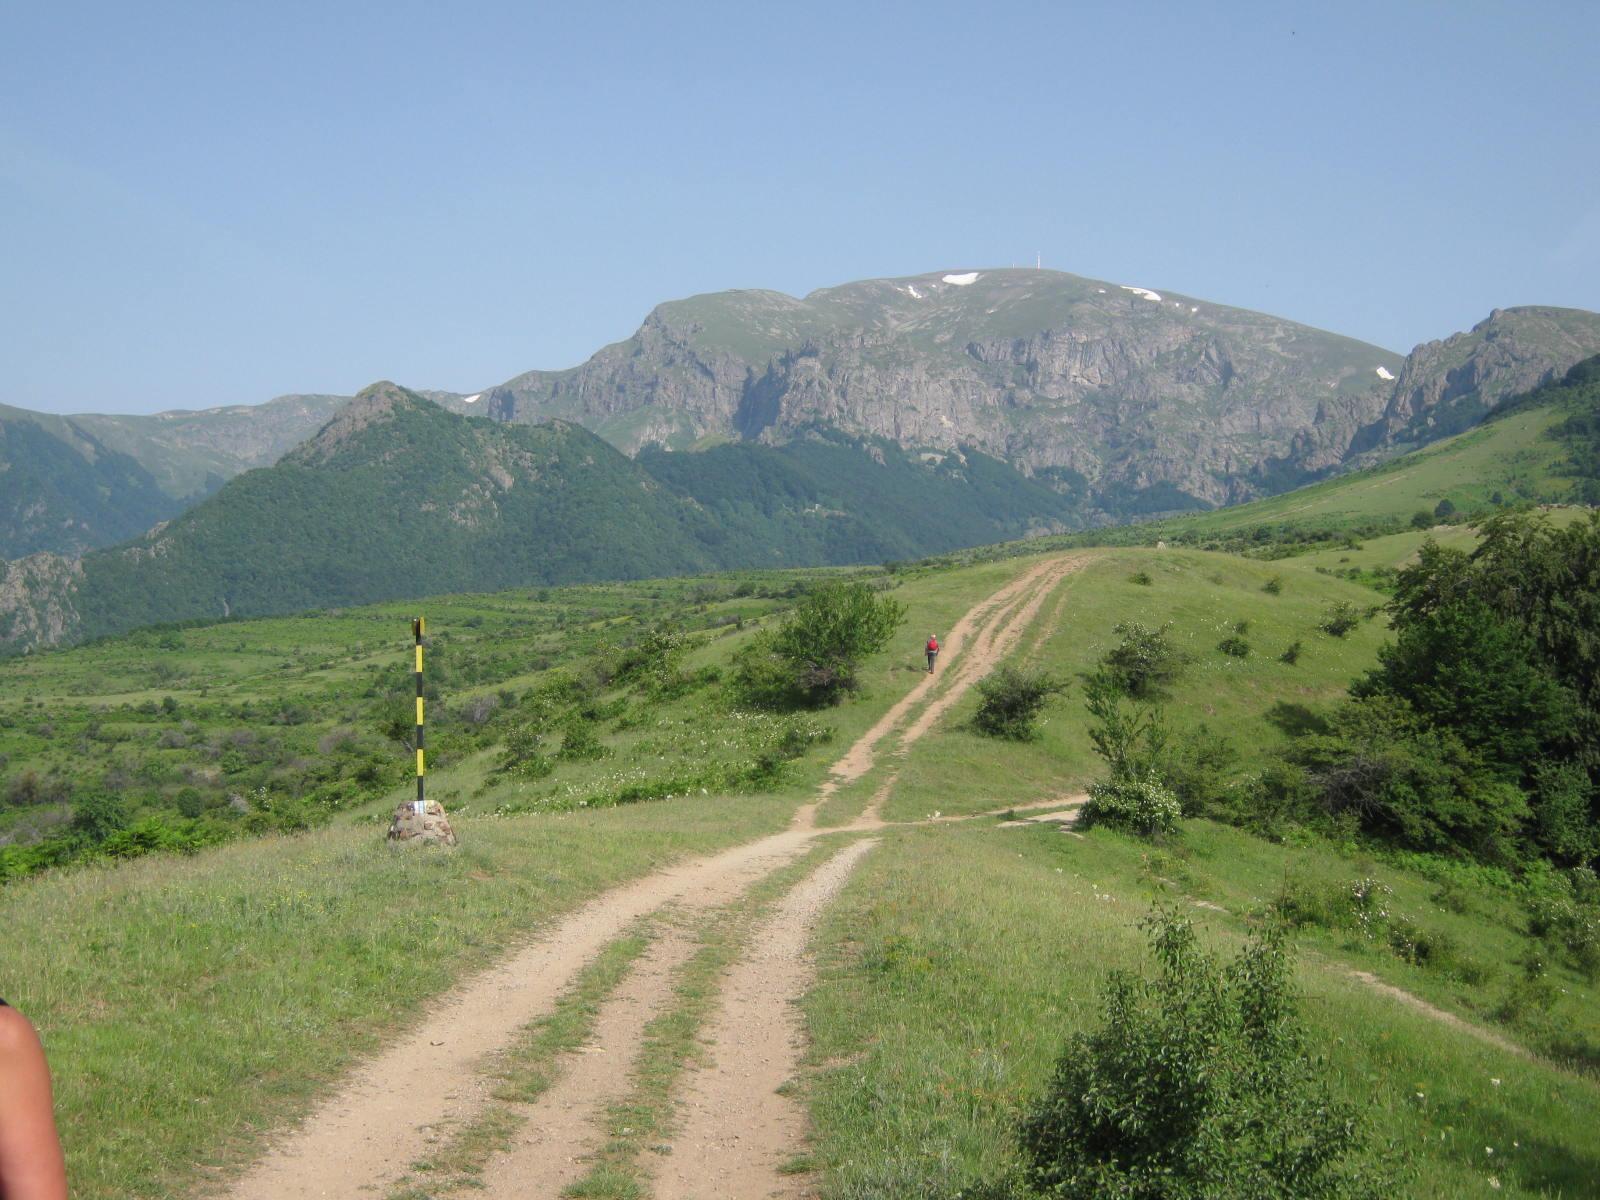 lucky tours co berg wandern und trekking in balkan gebirge bulgarien. Black Bedroom Furniture Sets. Home Design Ideas